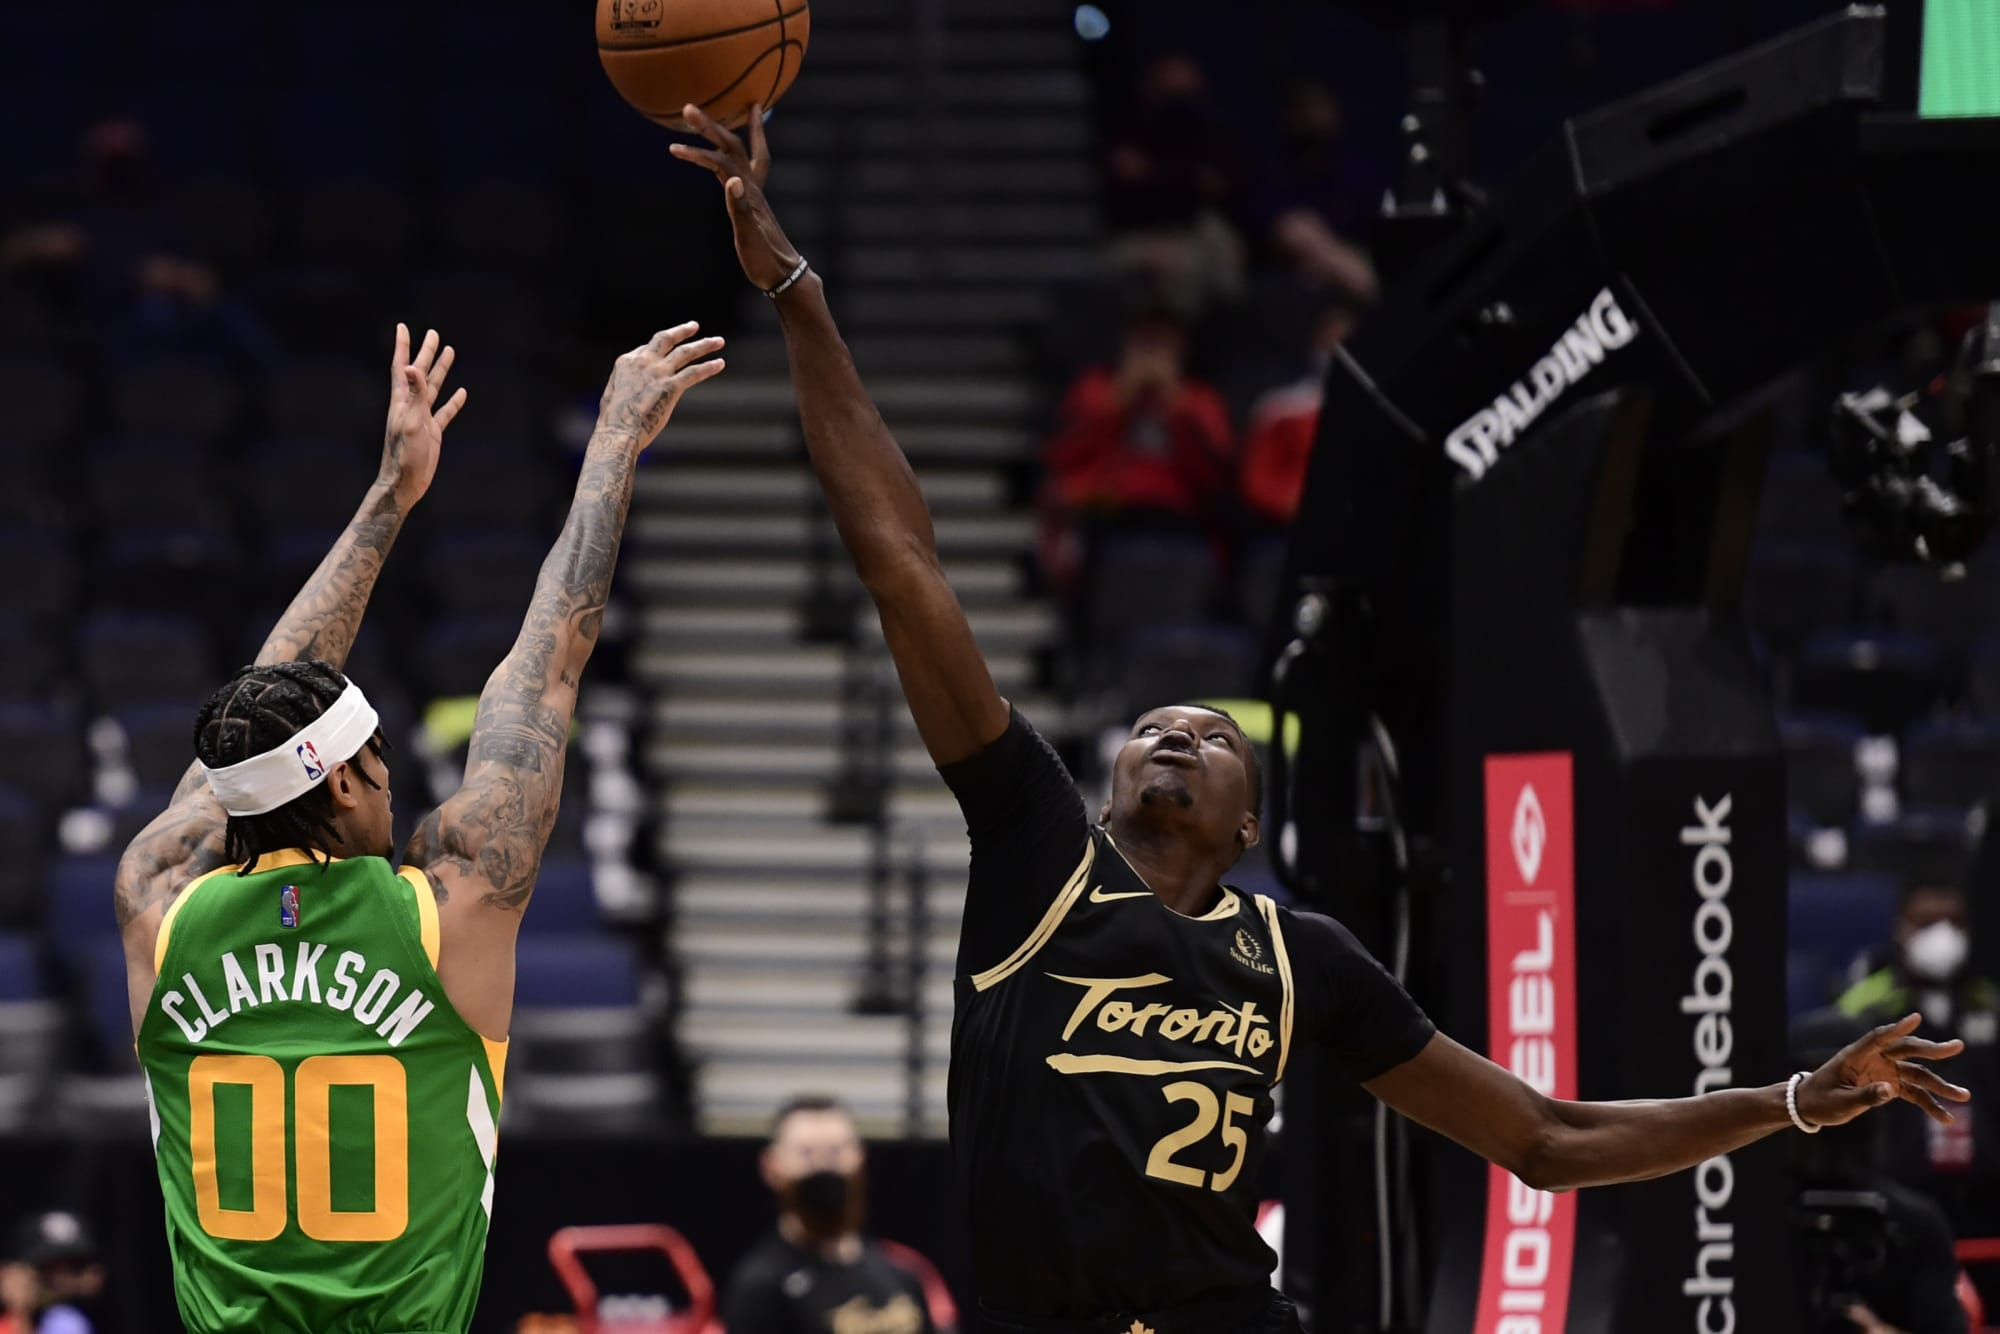 Toronto Raptors: Chris Boucher rips NBA on Instagram for Sixth Man snub